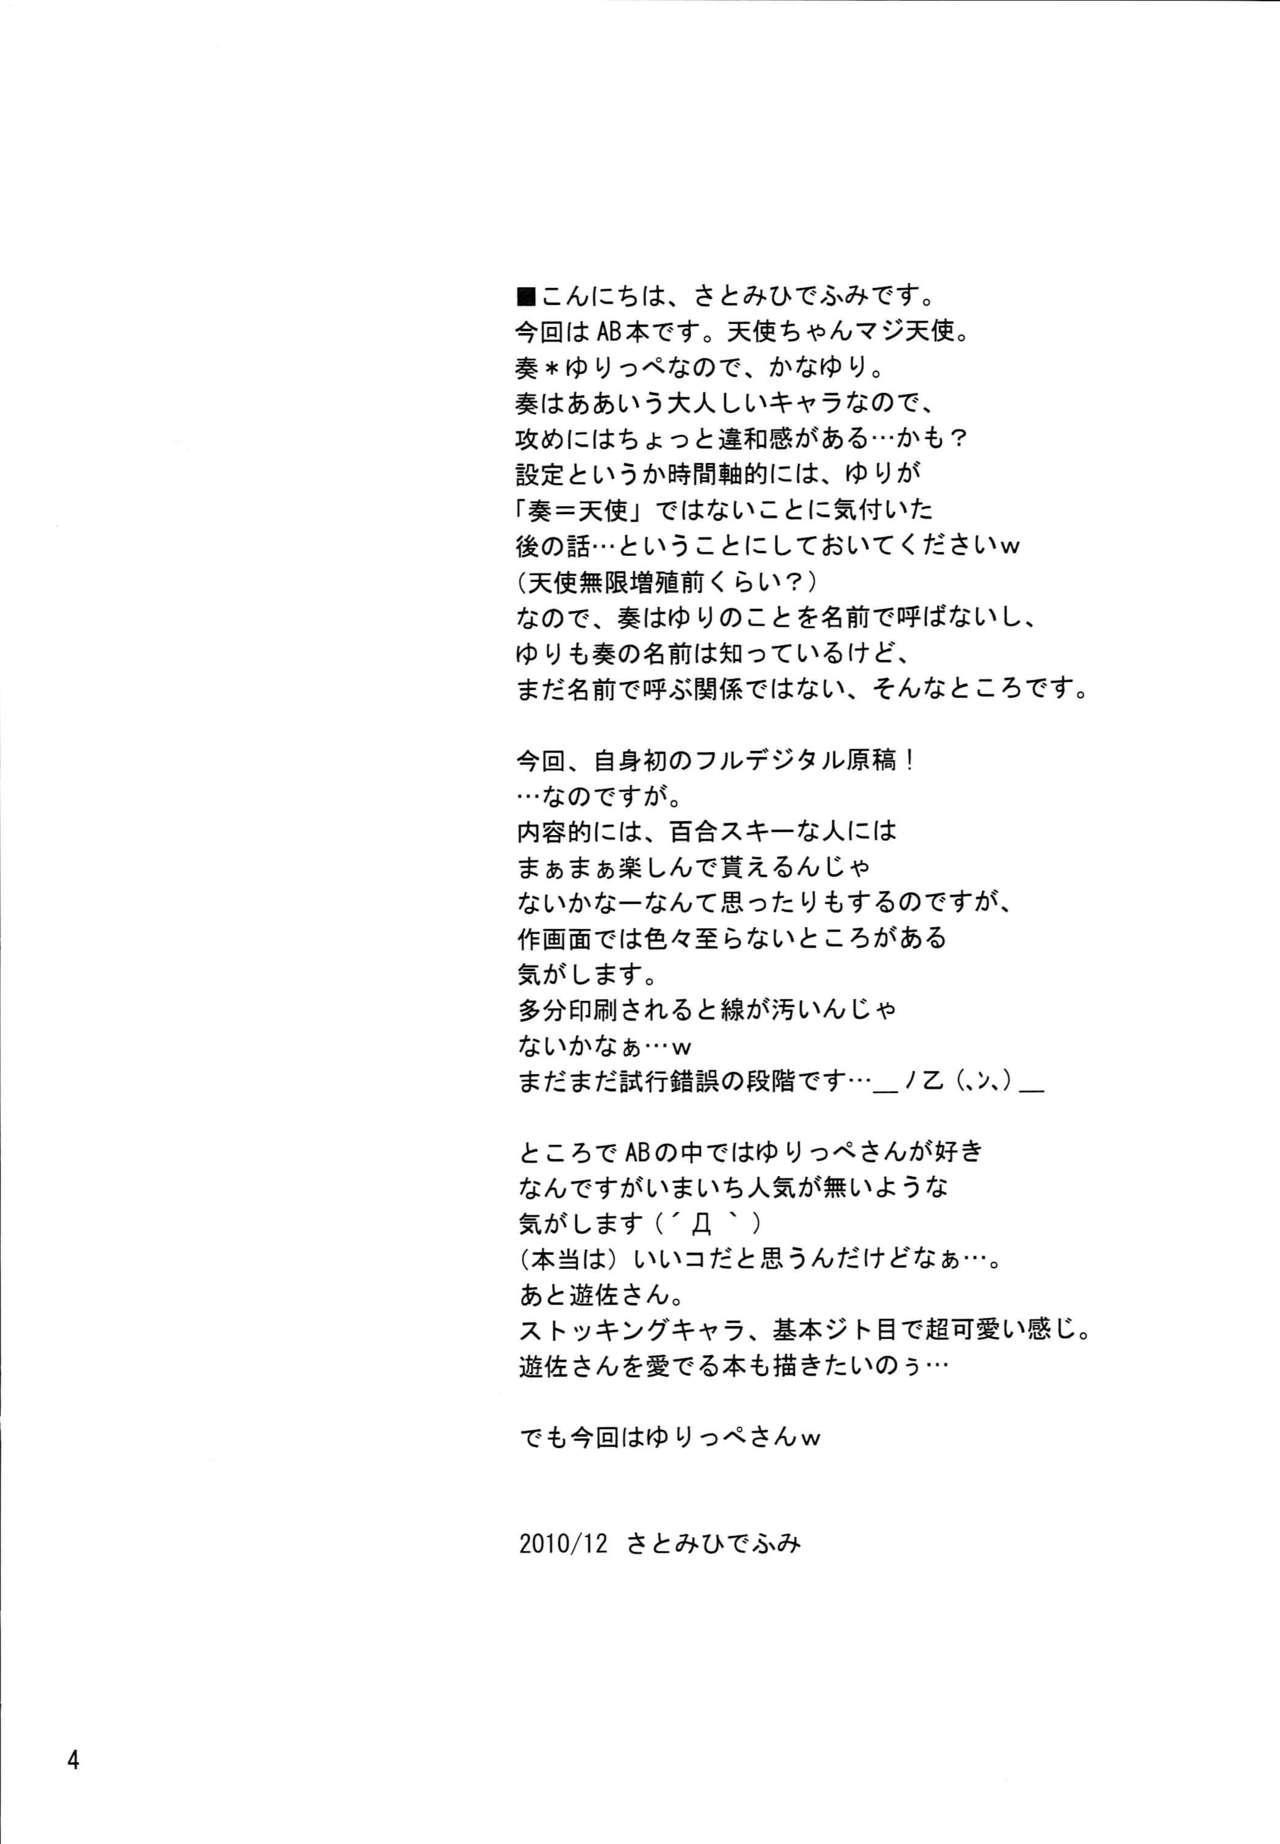 Kana * Yuri 2